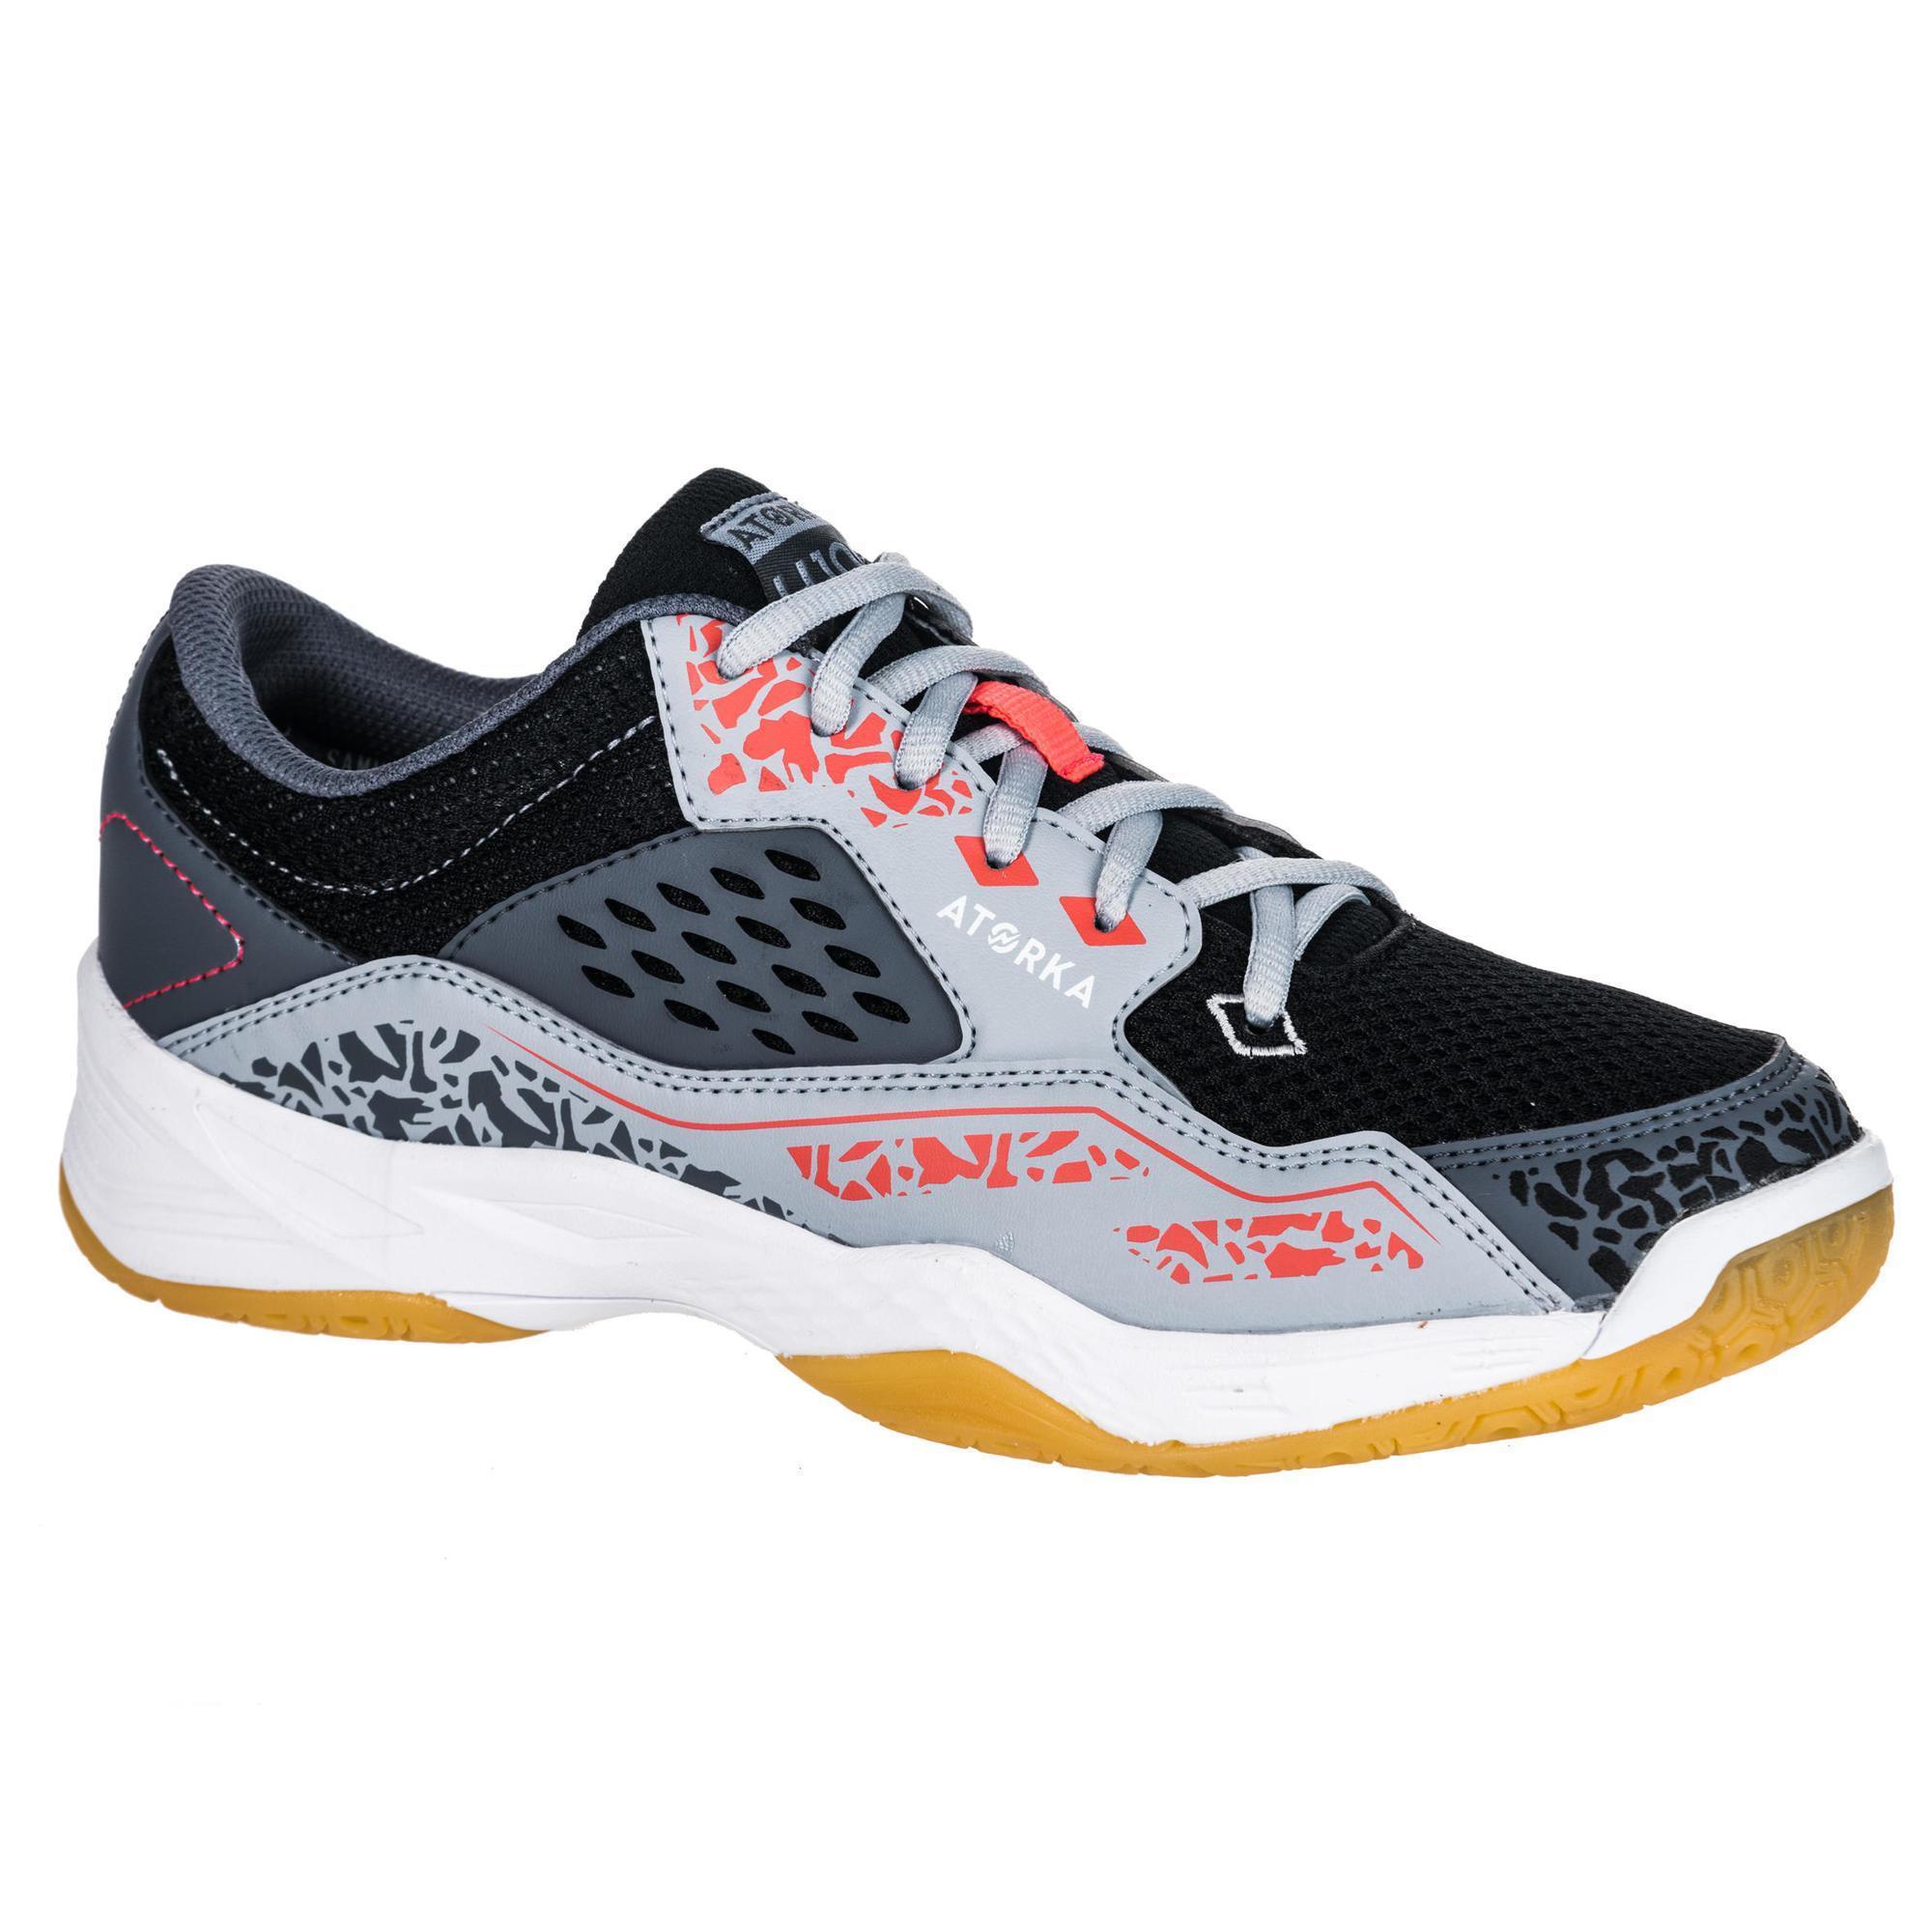 Handballschuhe H100 Erwachsene | Schuhe > Sportschuhe > Handballschuhe | Atorka